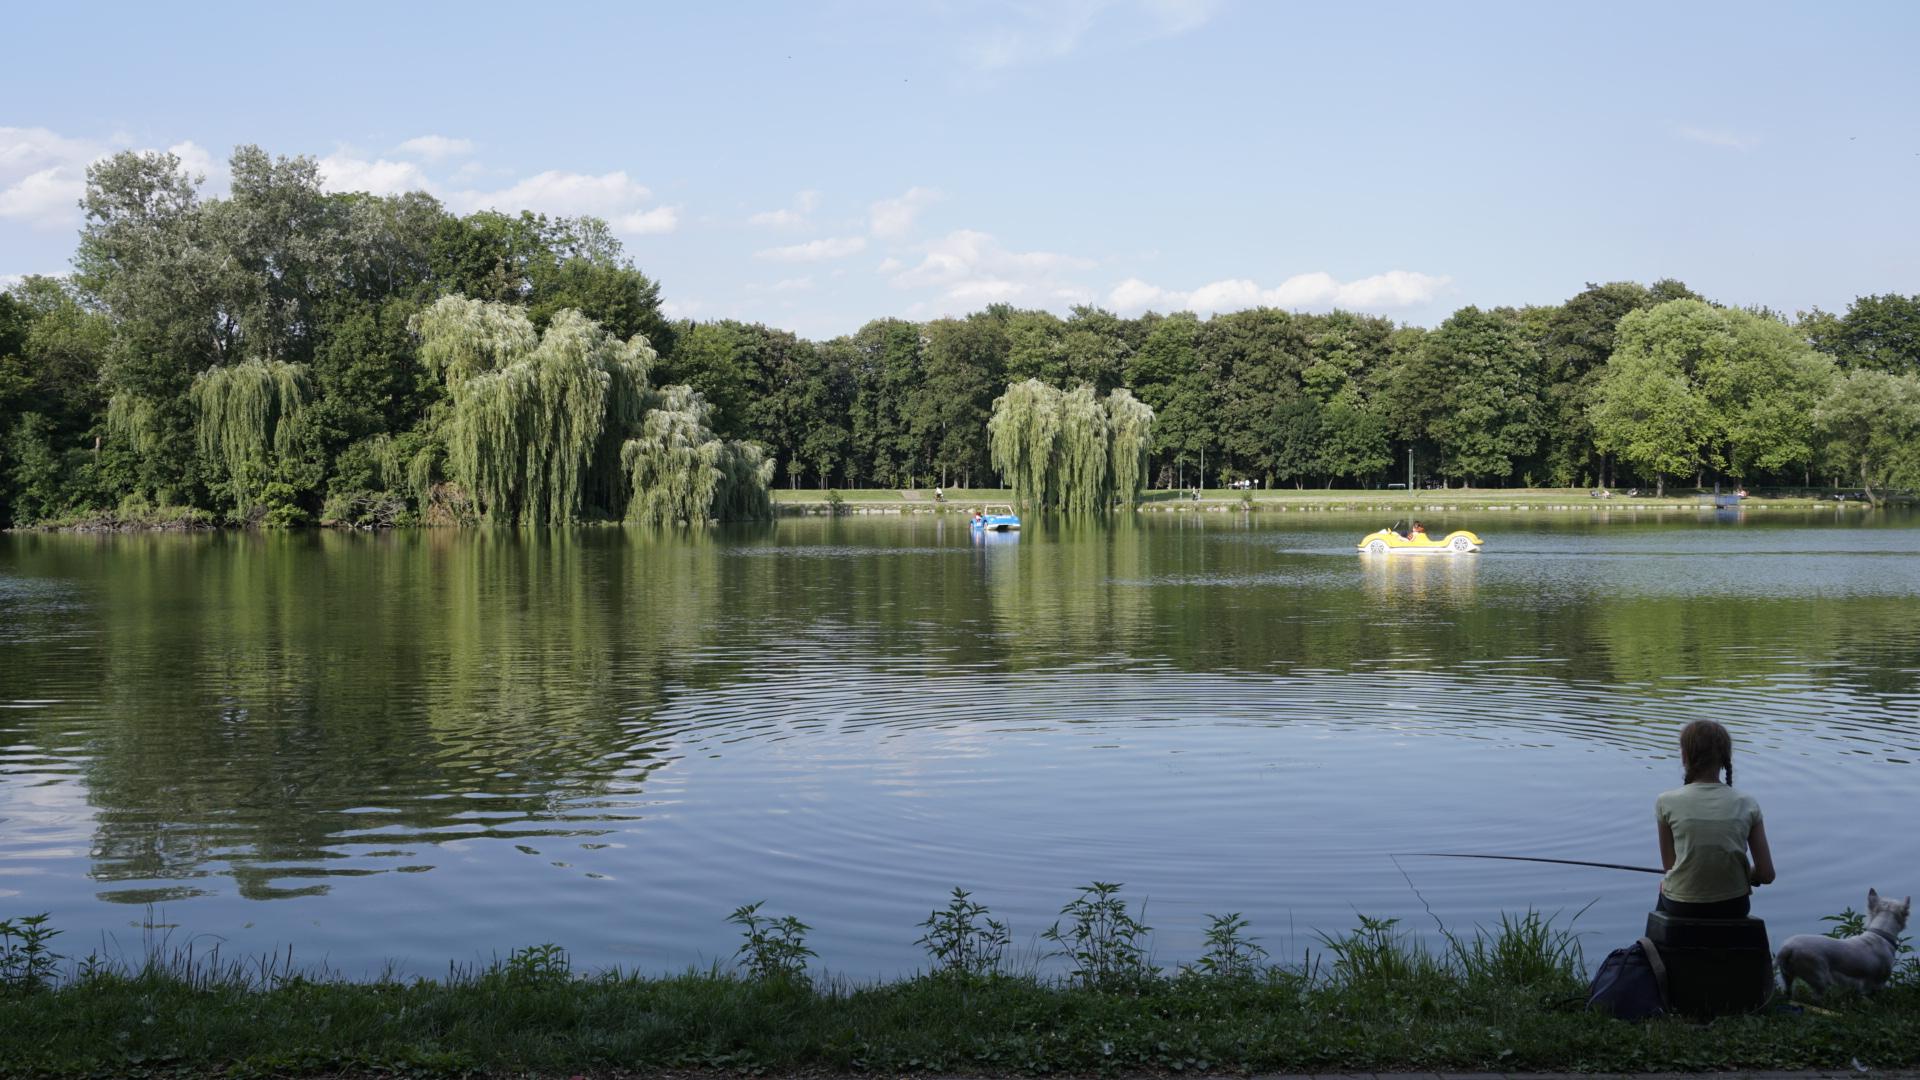 What to do in Krakow - go to Nowa Huta Lagoon